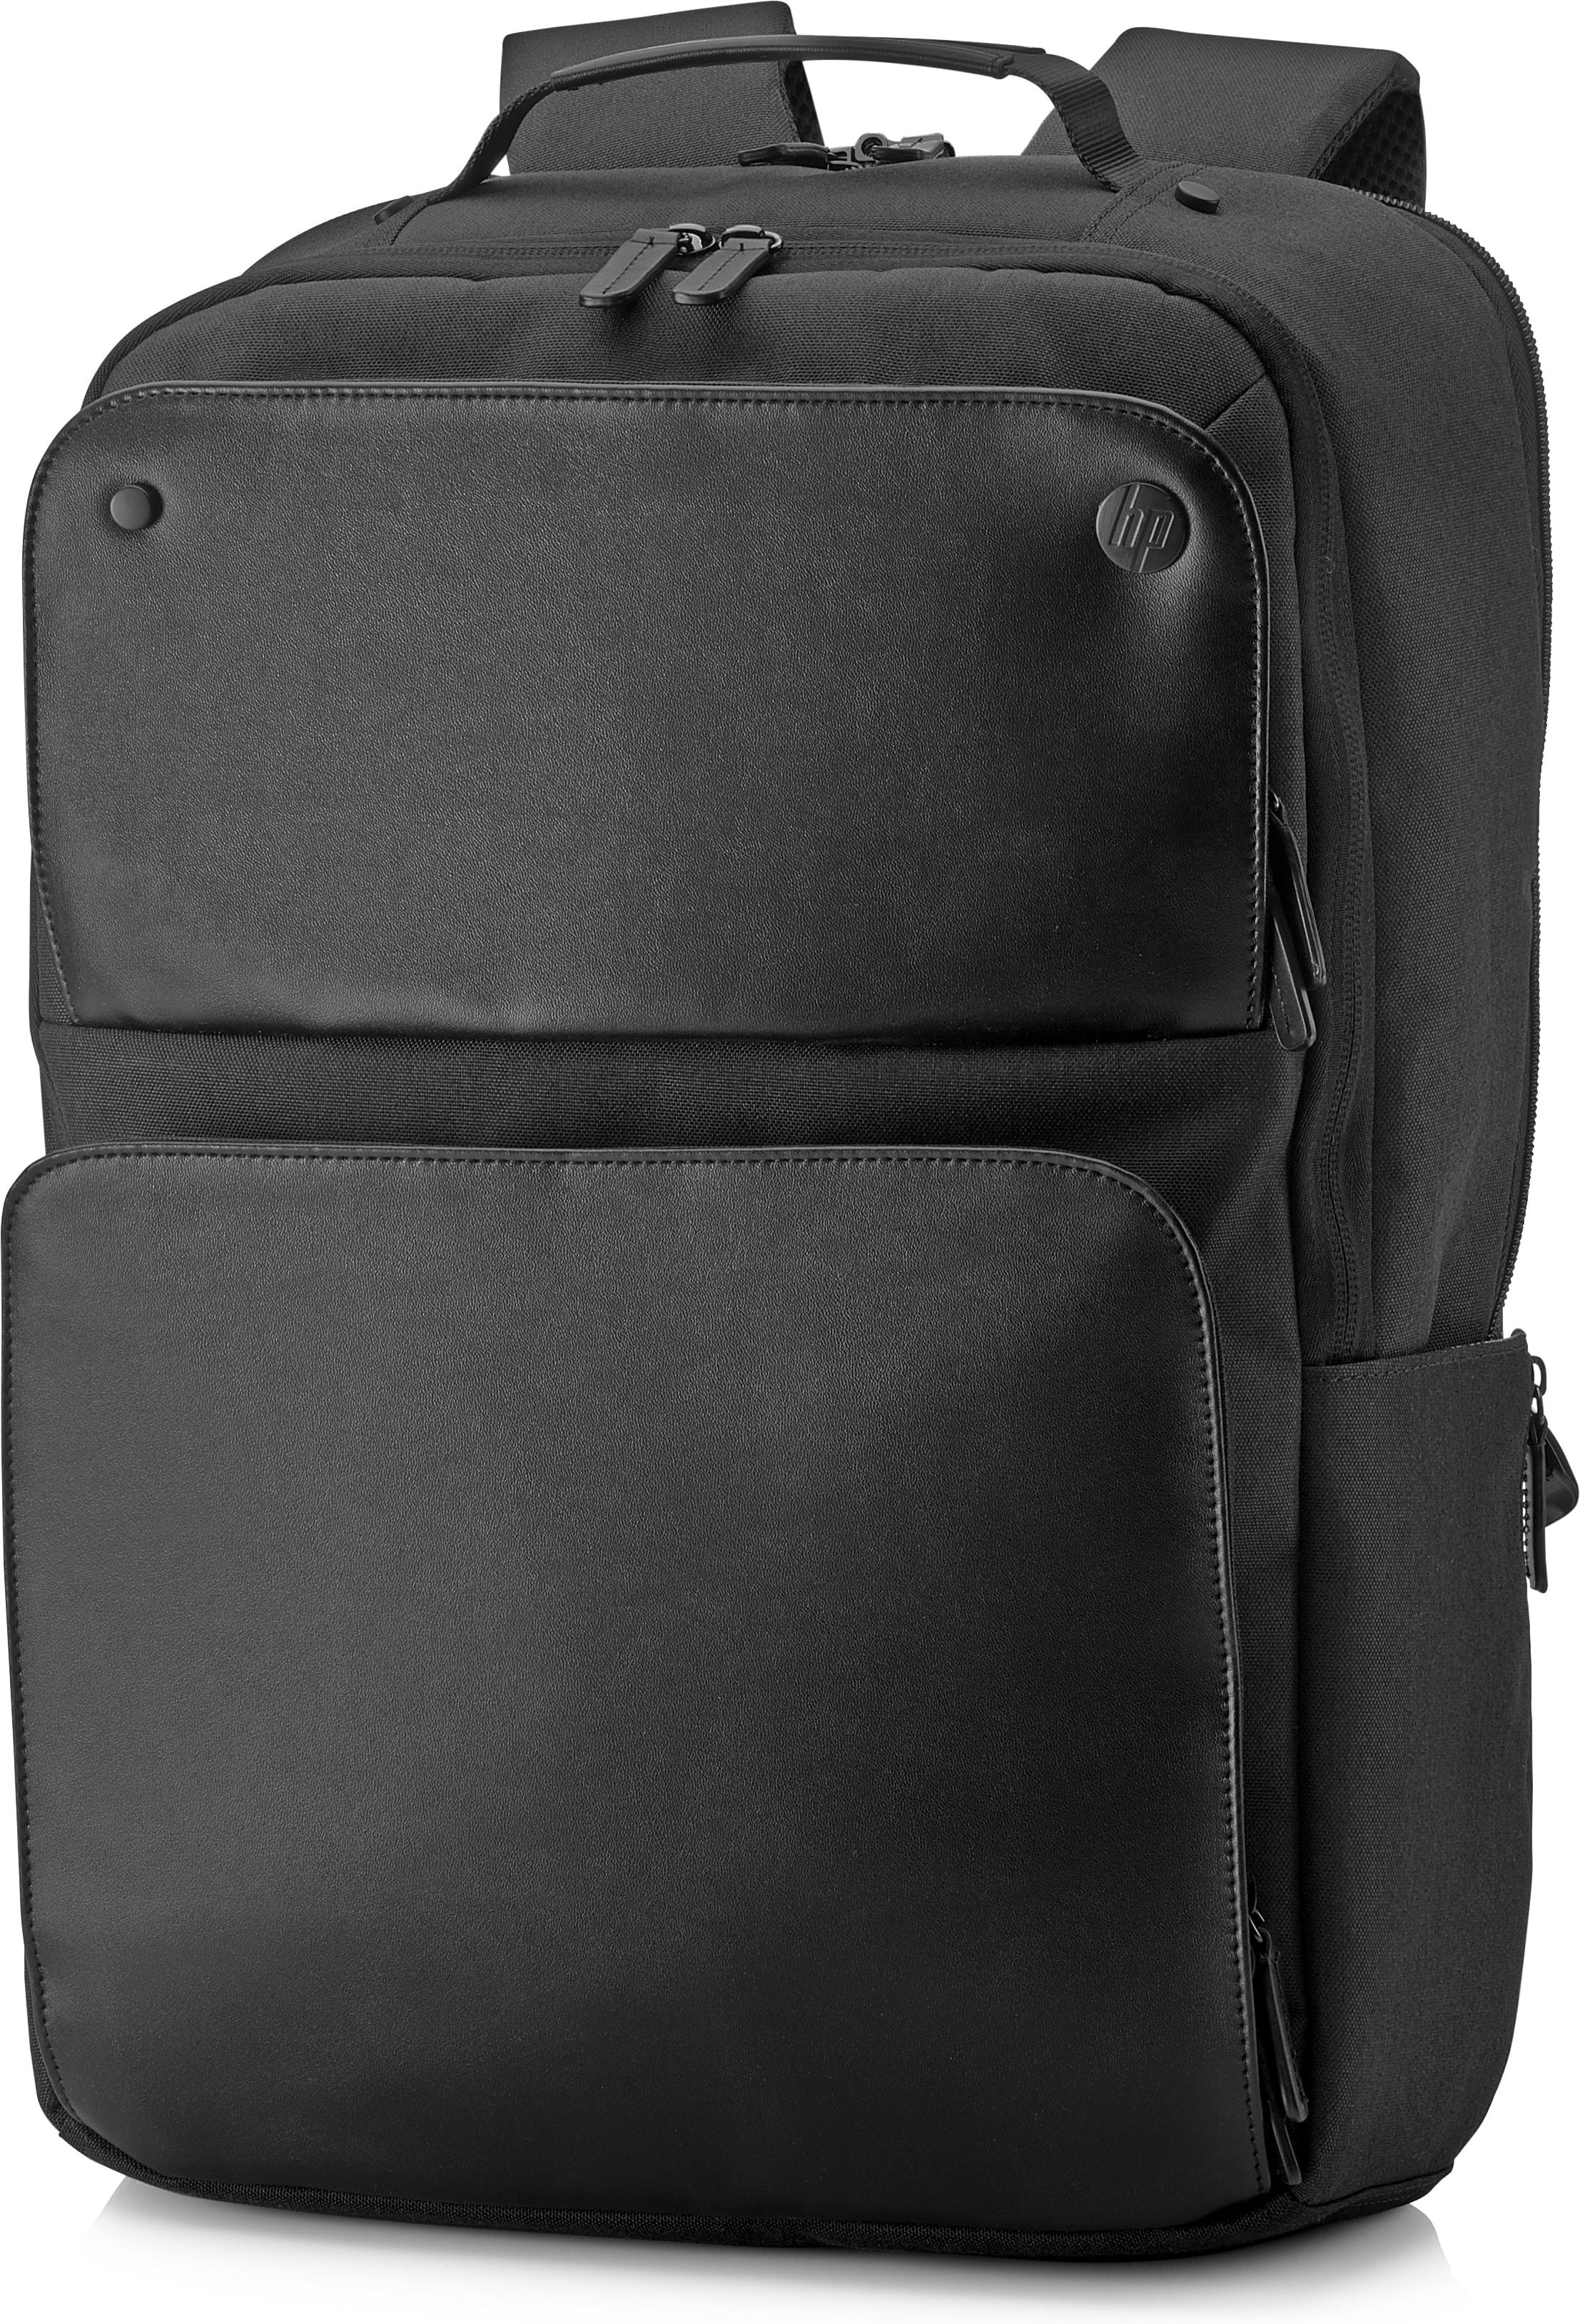 b9f2200b87d HP Exec 17,3 Midnight Backpack (1KM17AA) kopen » Centralpoint